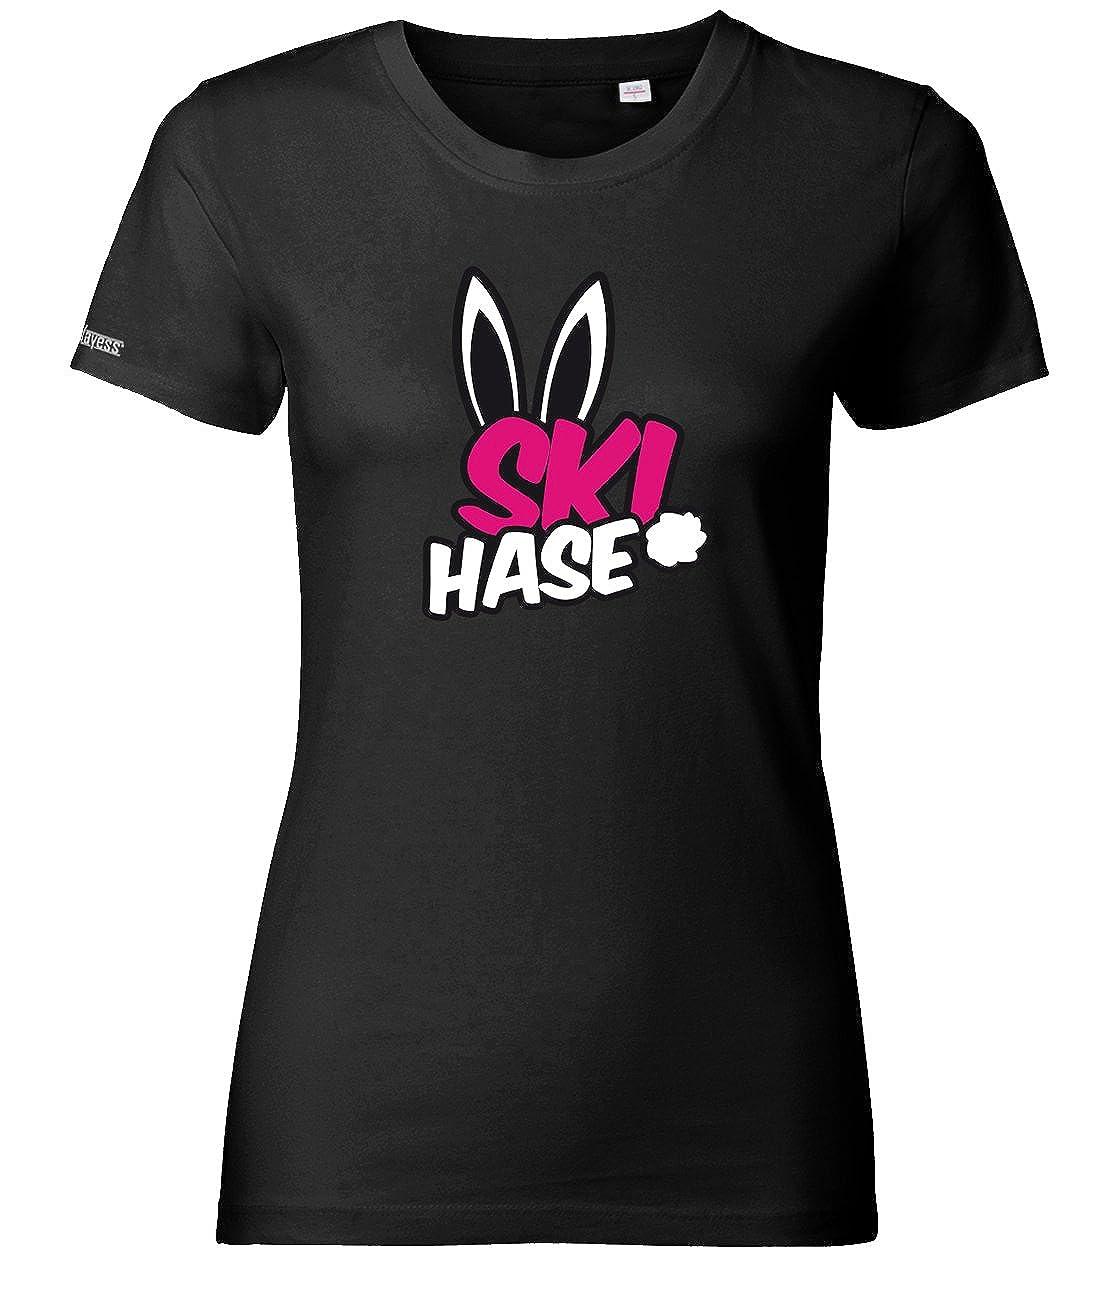 Jayess Skihase - Apres Ski Sport - WOMEN T-SHIRT